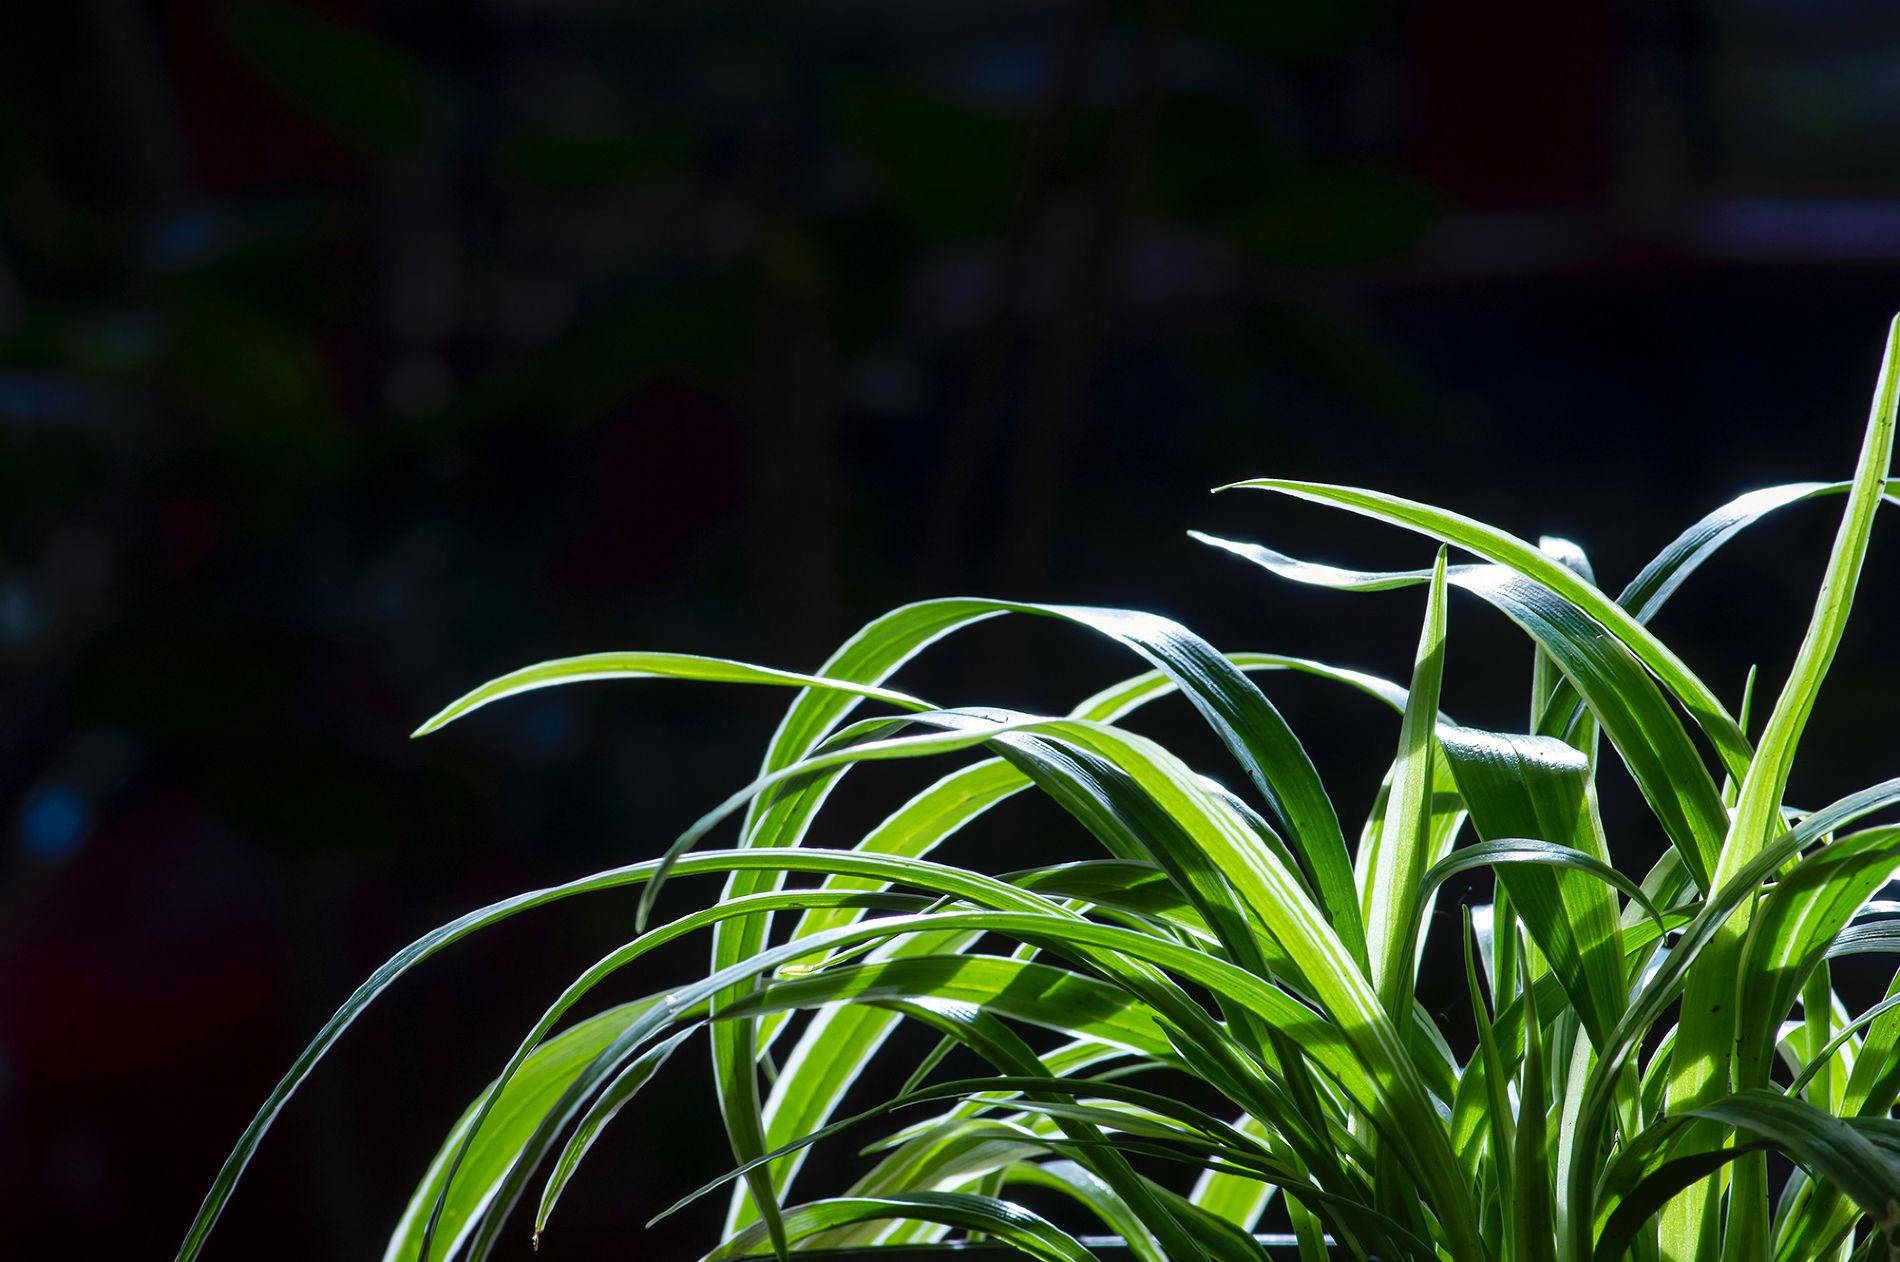 Хлорофитум ©Фото Jakasuryanta, freepik.com